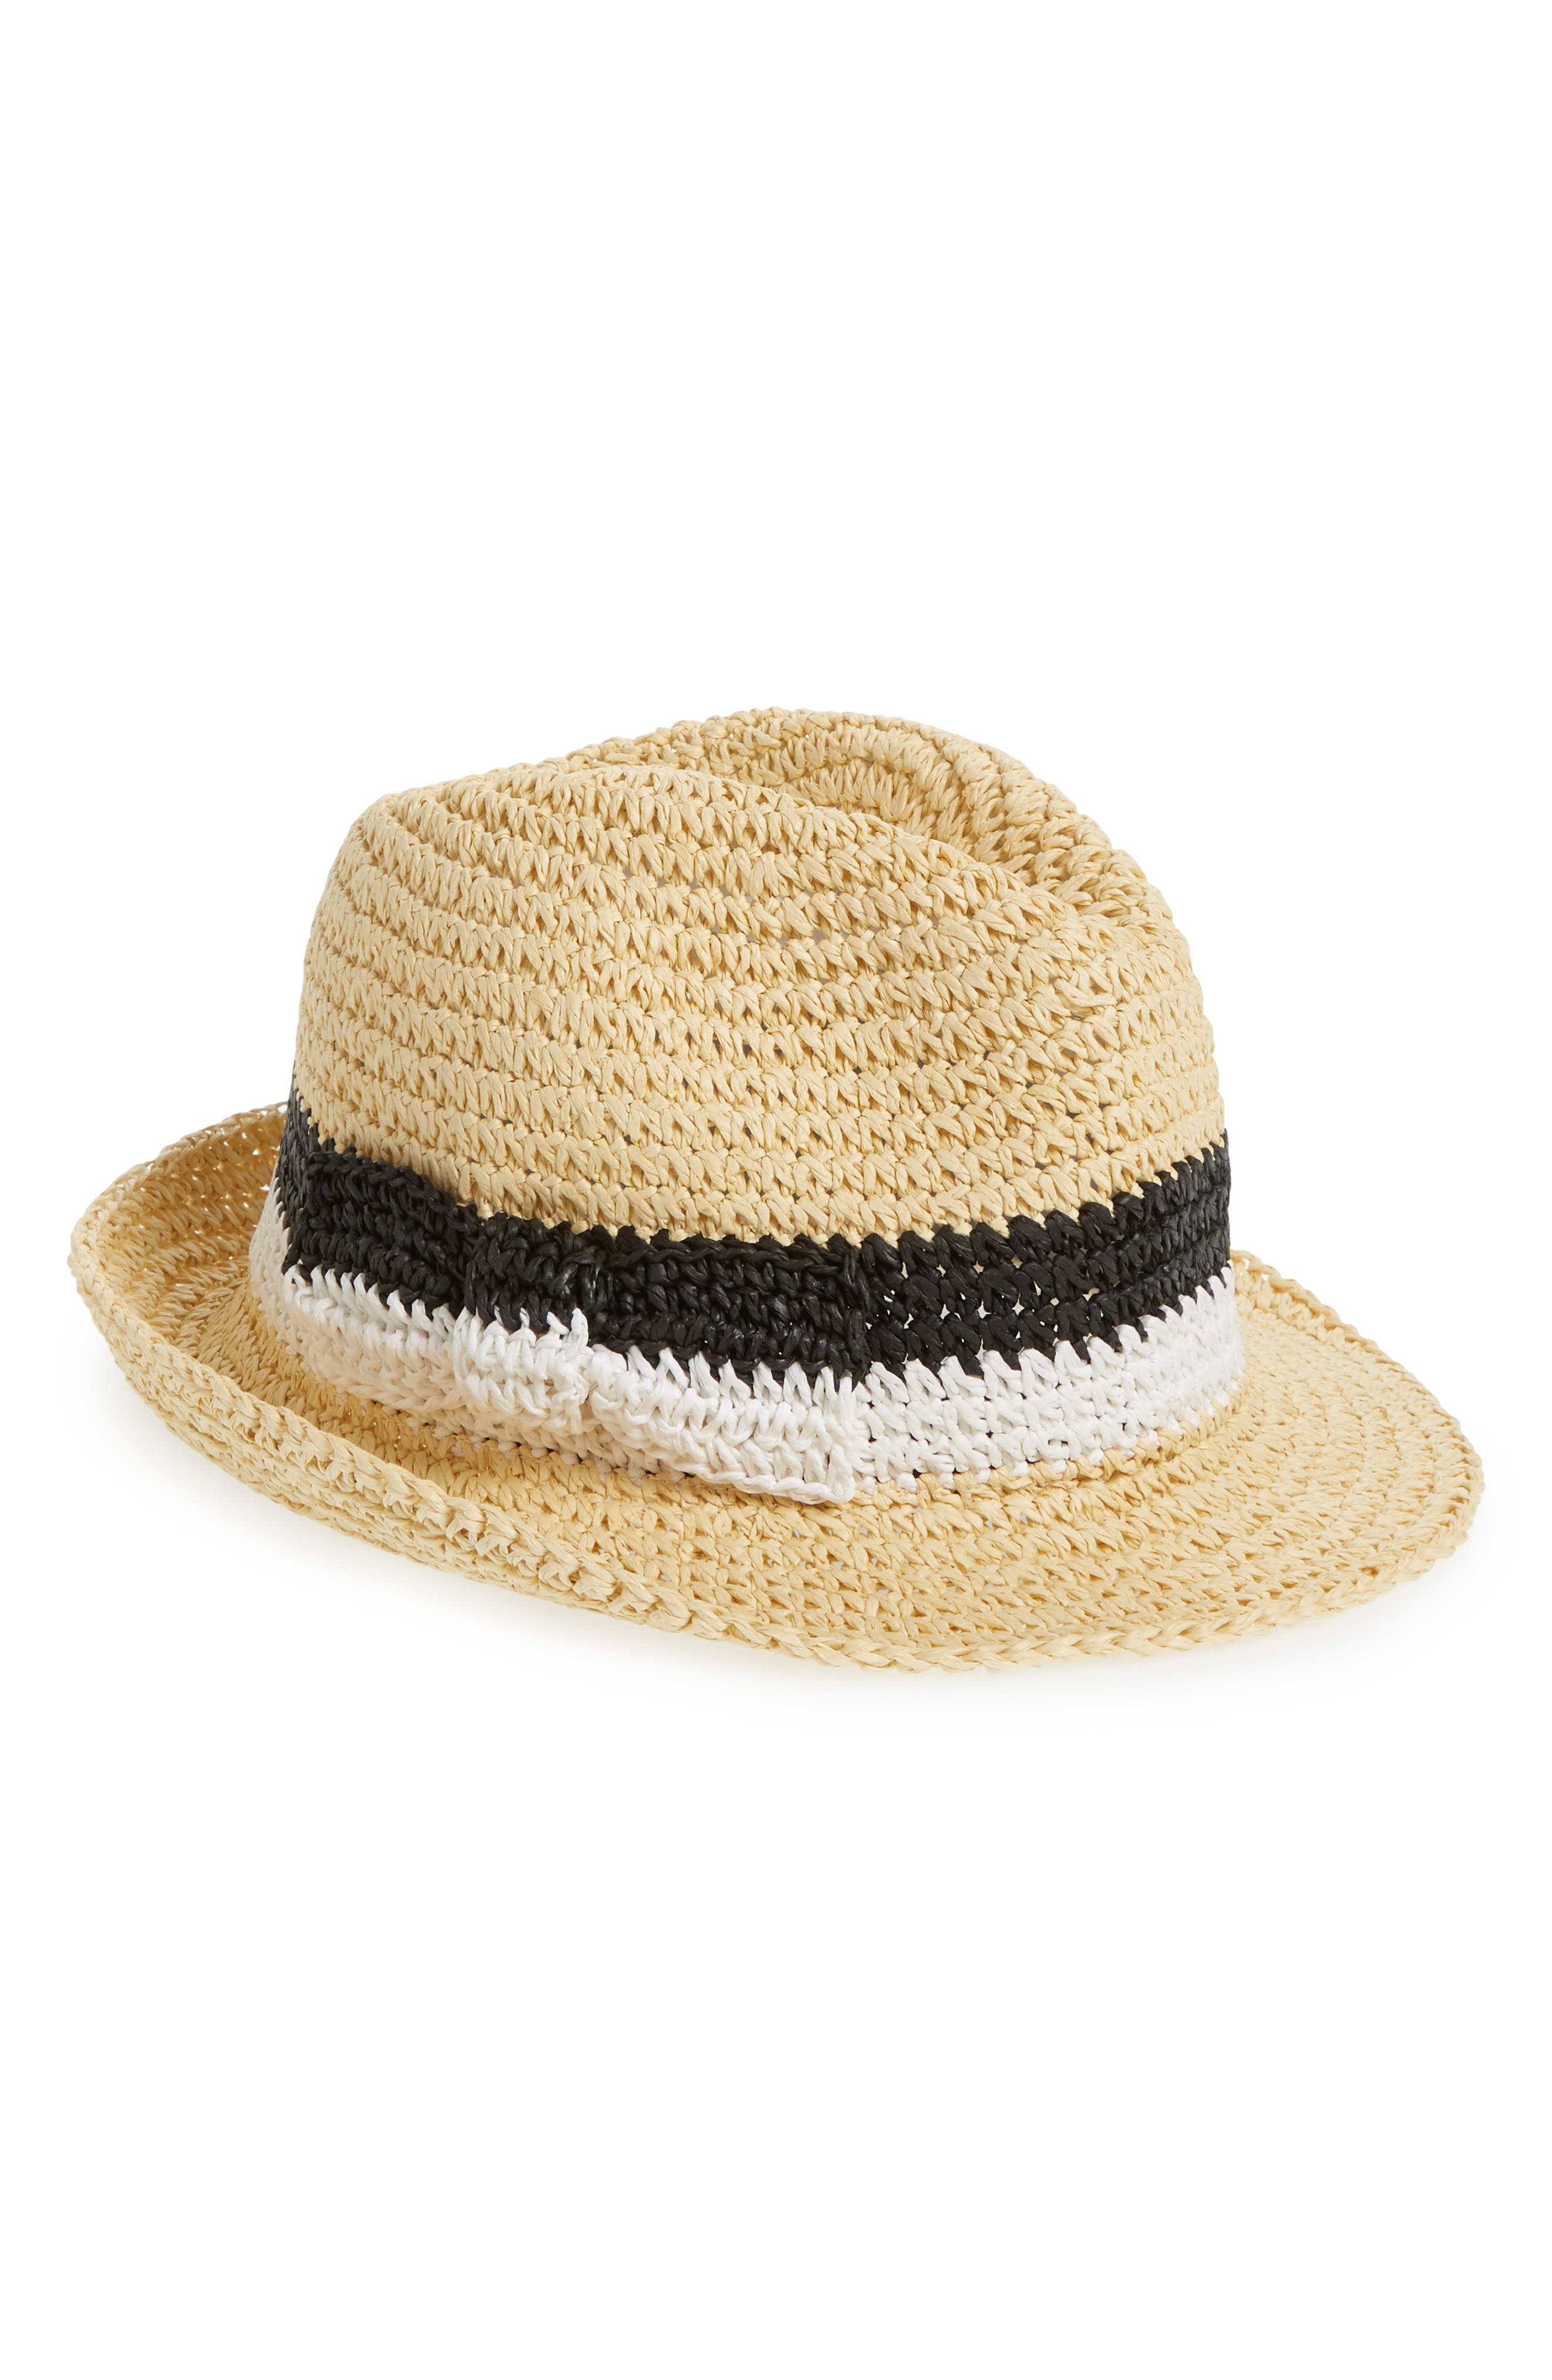 kate spade stripe bow straw trilby,                         Main,                         color, Natural/ Black/ White